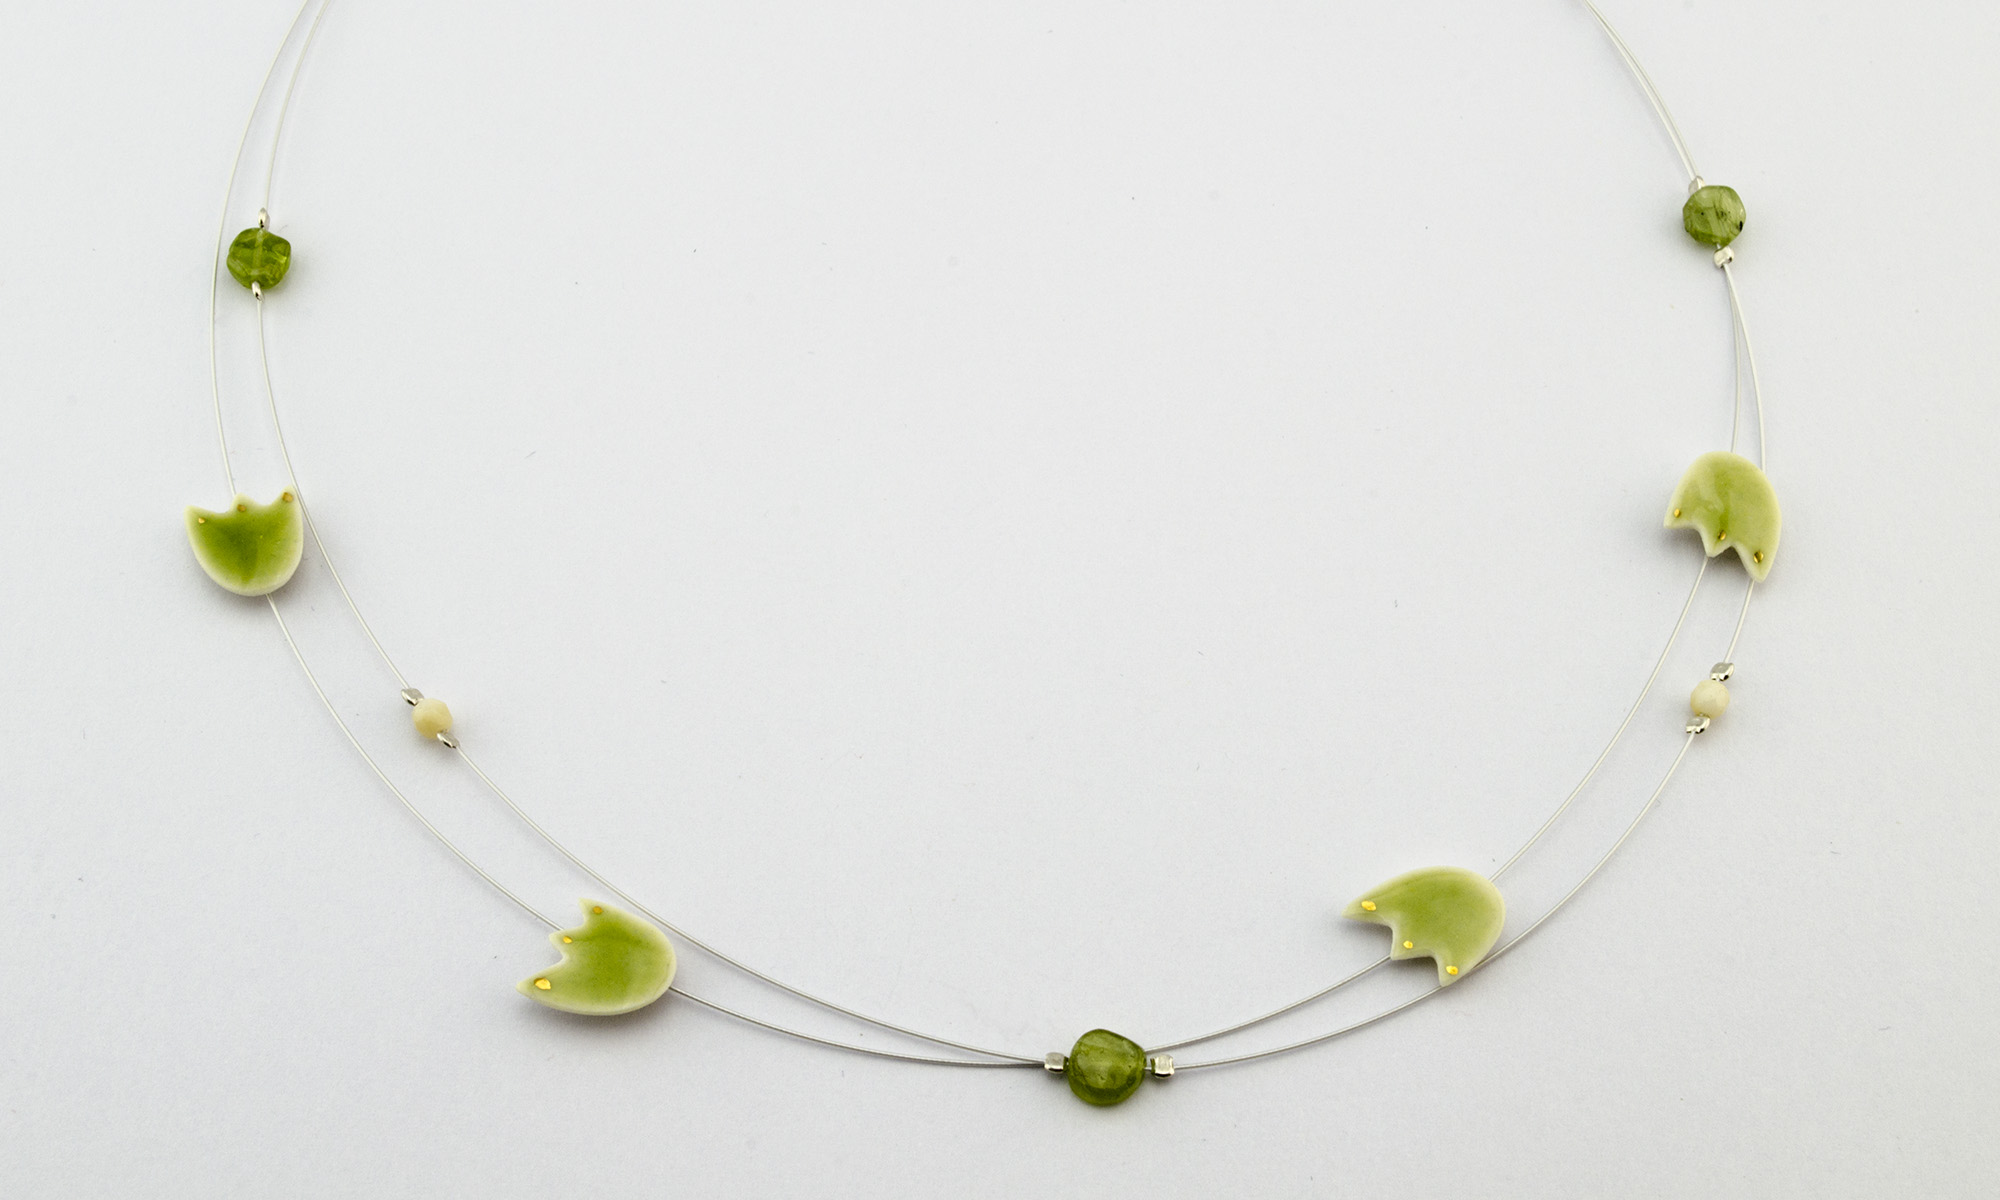 Porzellanschmuck - Maja Wlachopulos - Schmuck aus Porzellan